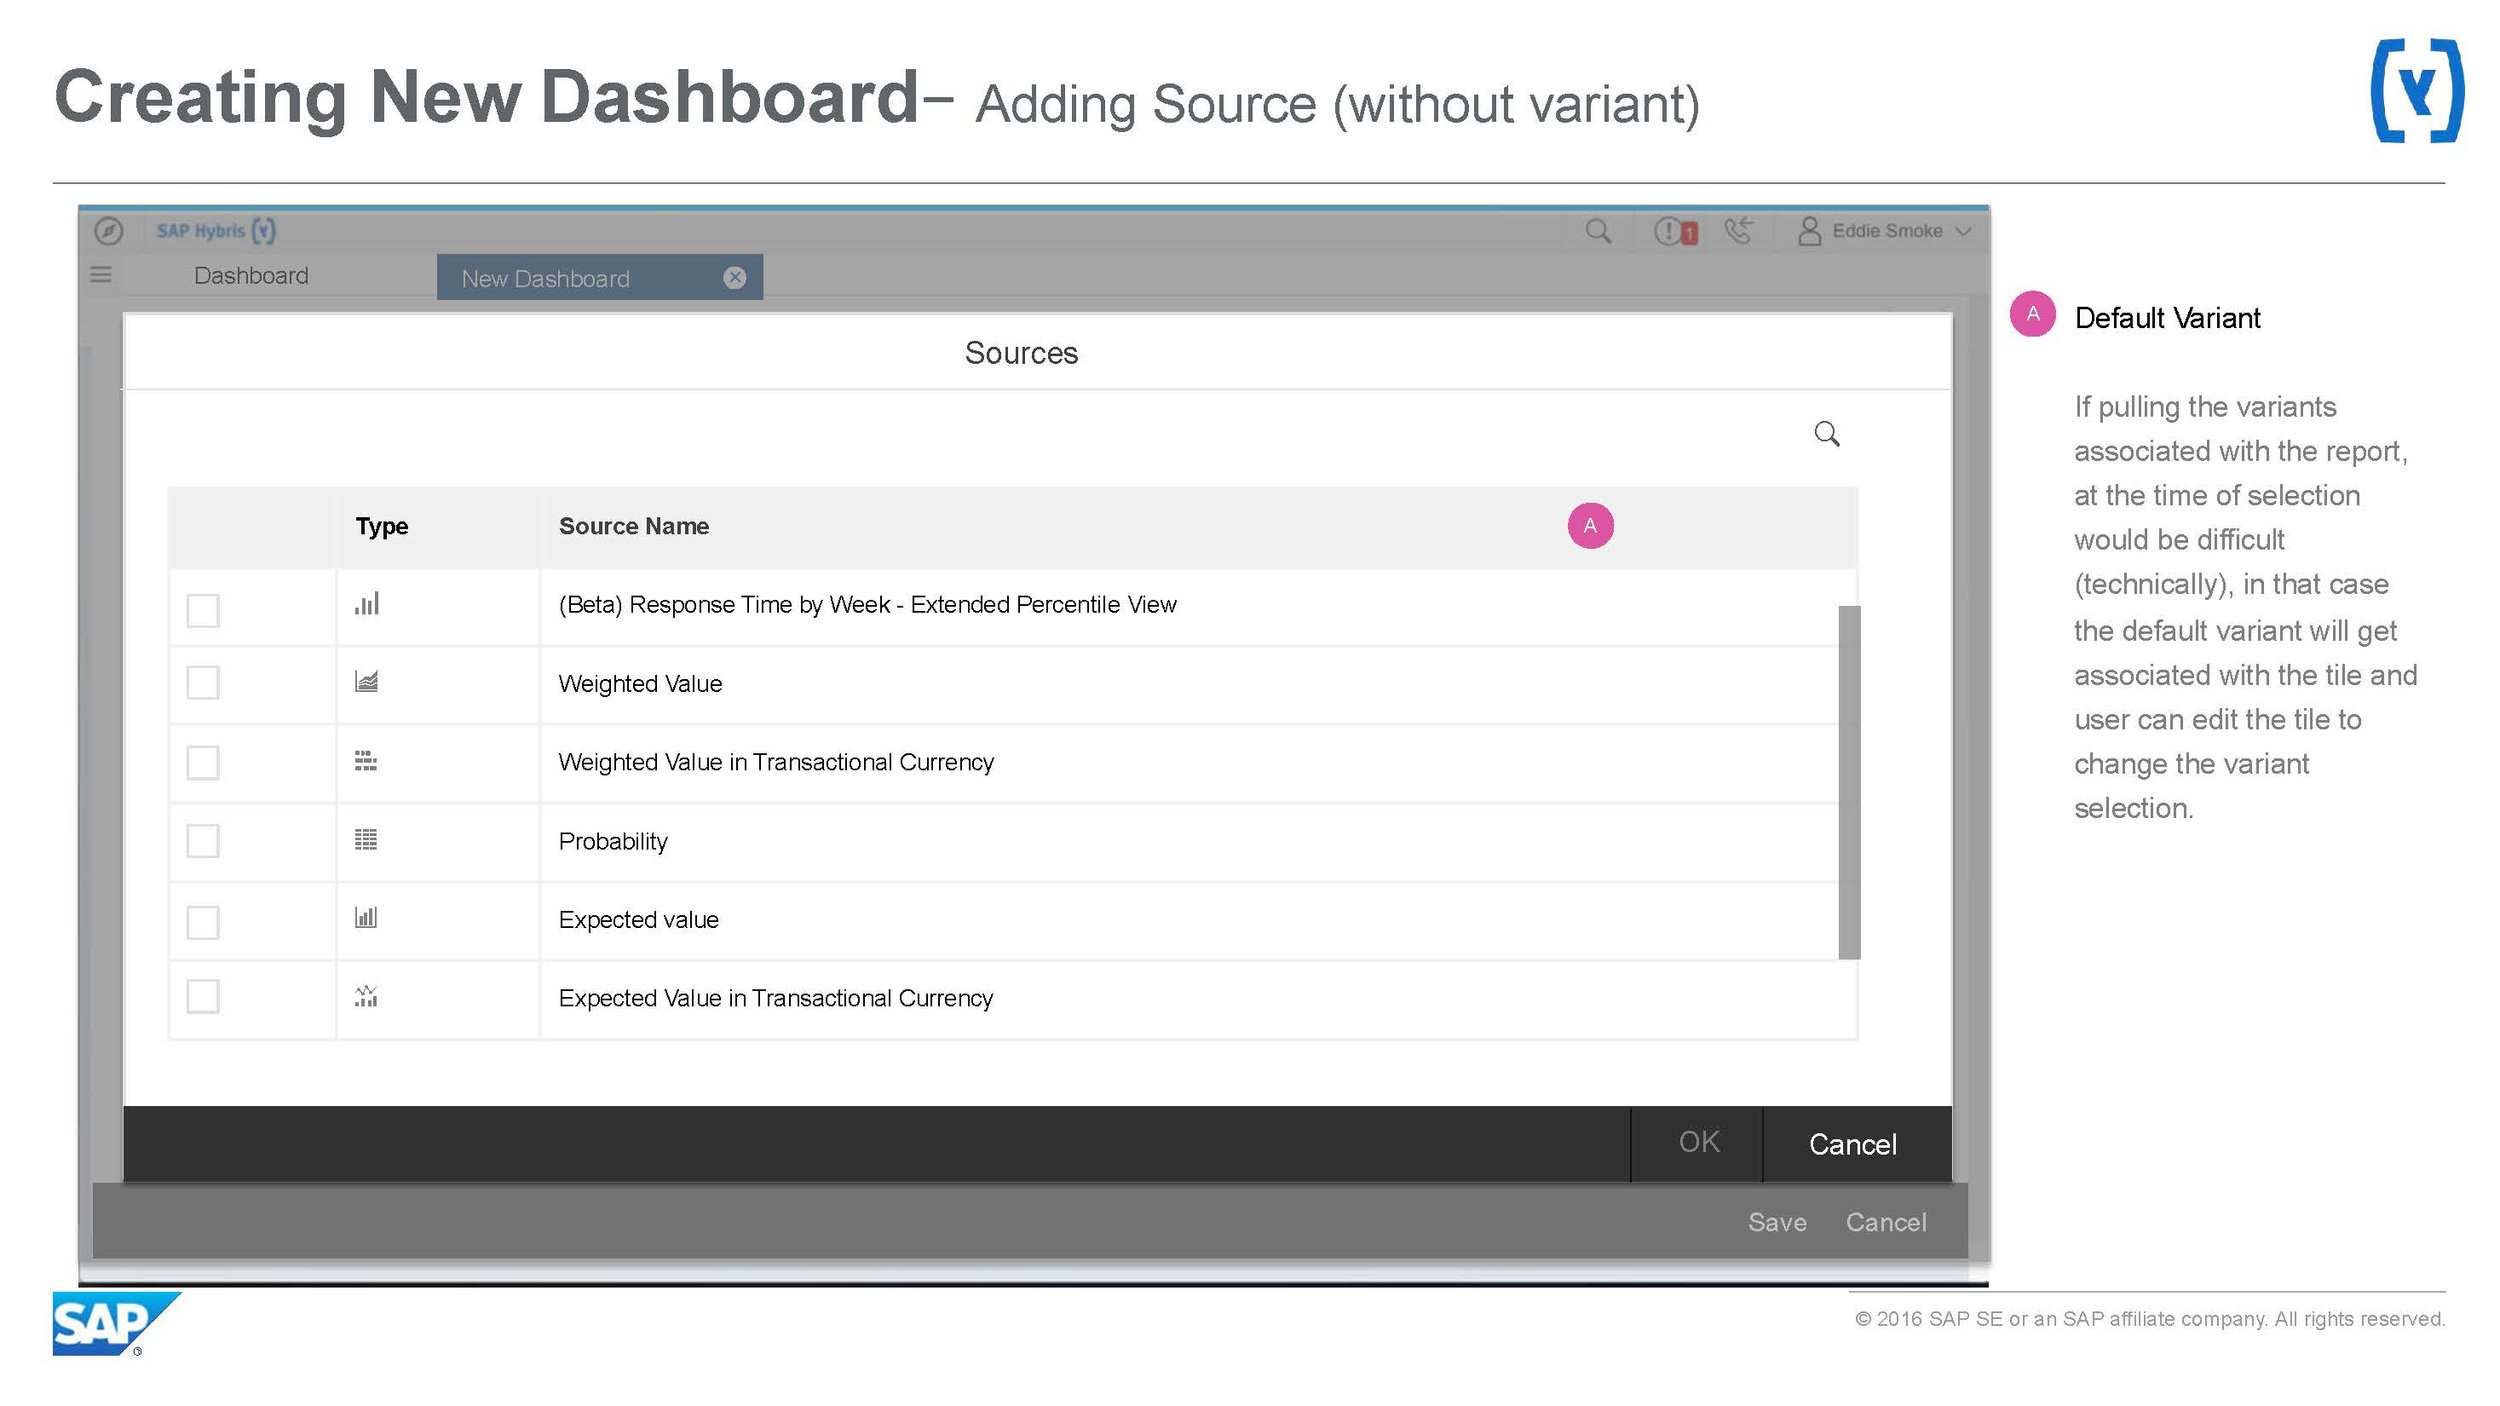 1705_Analytics_Dashboard Creation V3.0_Page_11.jpg